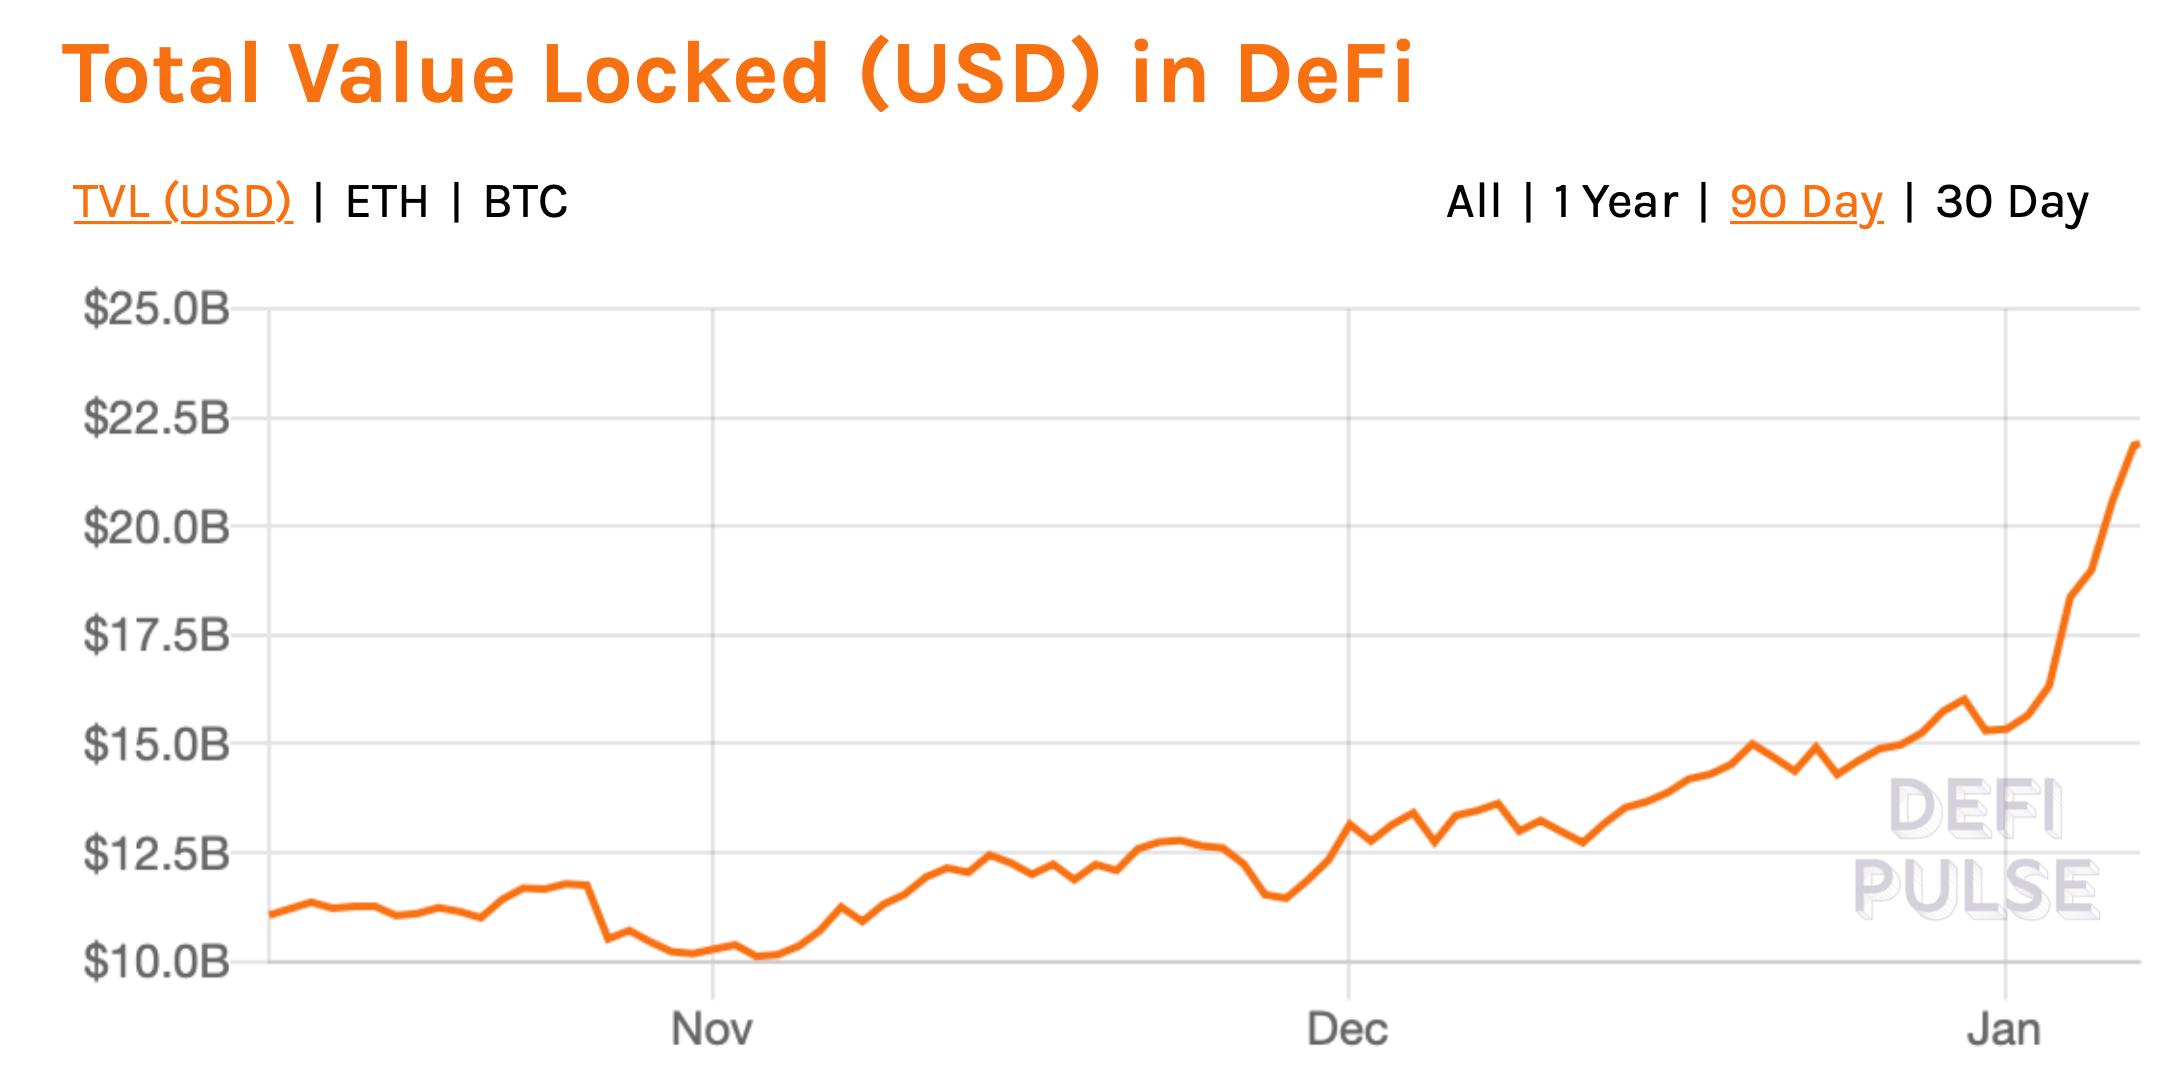 Объём средств в нише DeFi